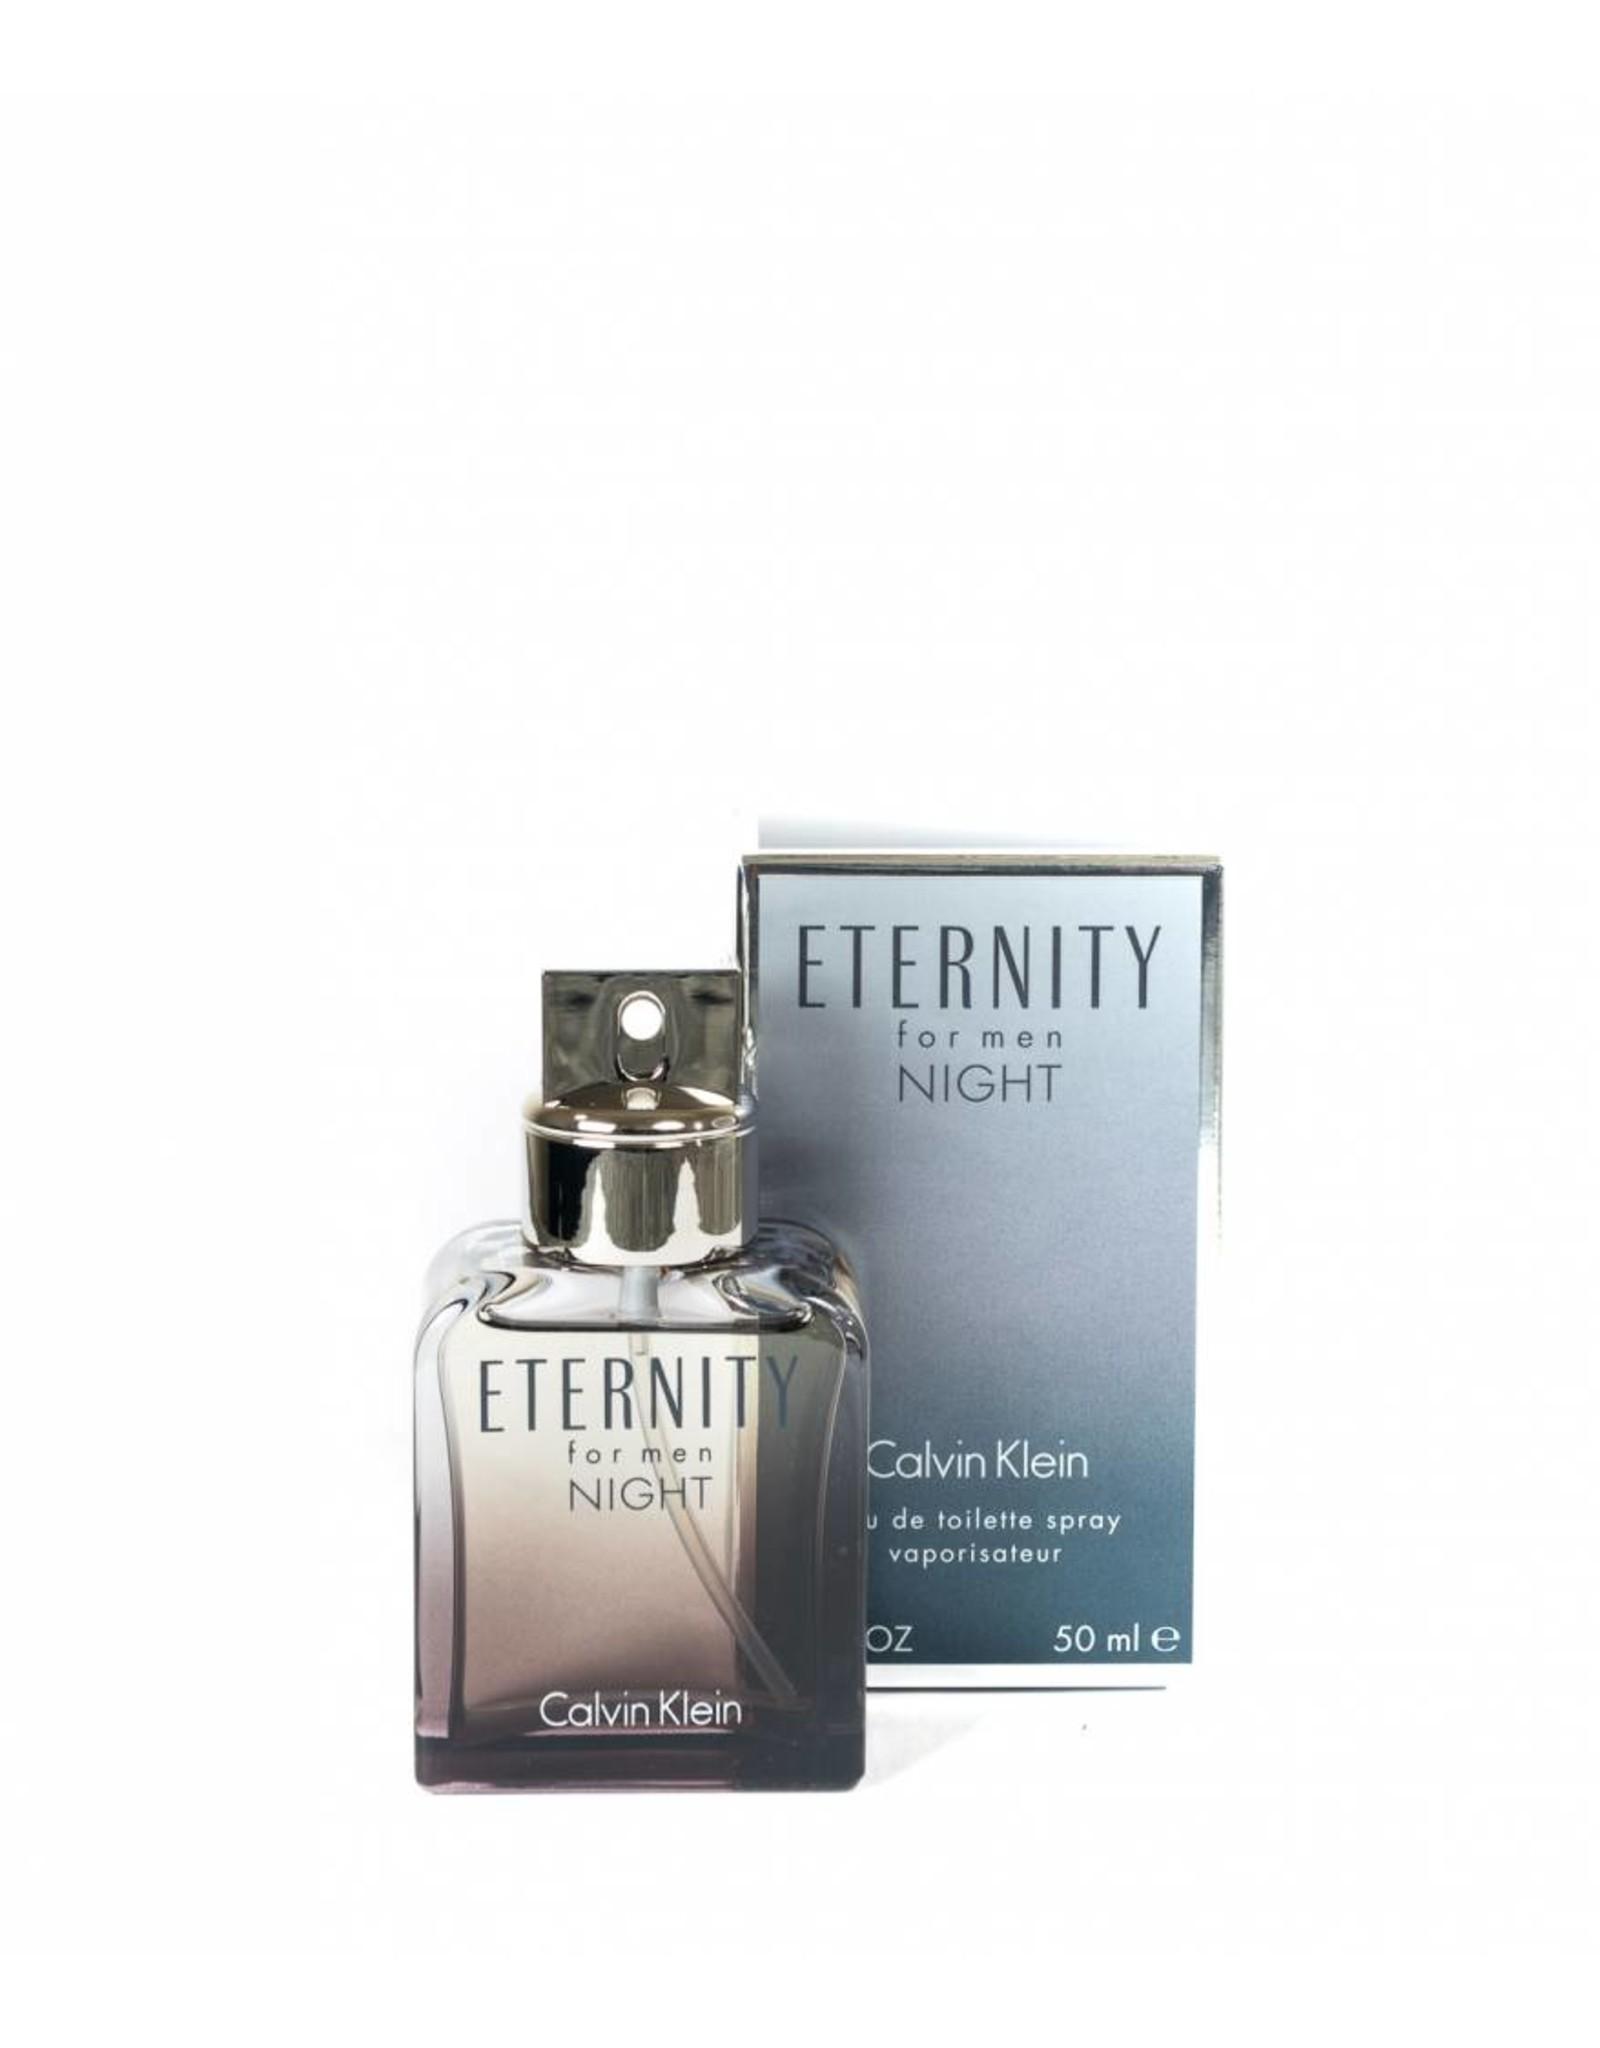 CALVIN KLEIN CALVIN KLEIN ETERNITY NIGHT FOR MEN